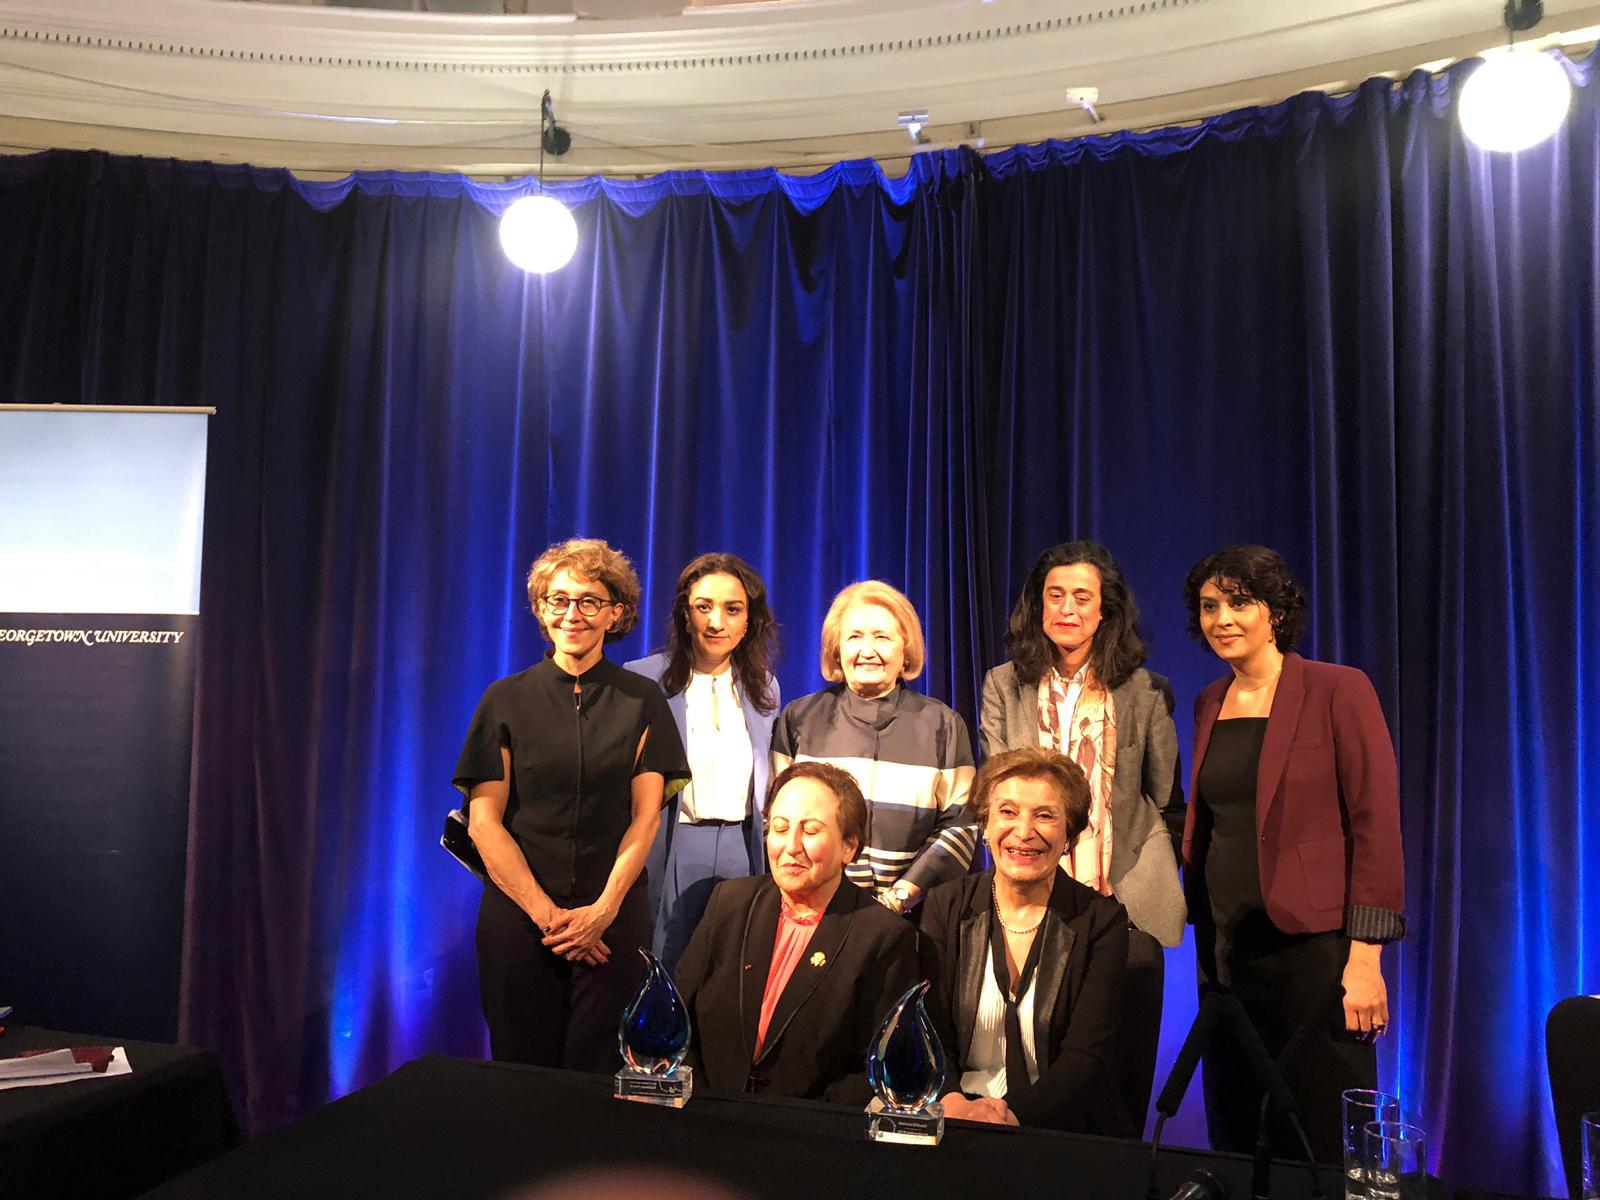 Awardees with panelists and Ambassador Melanne Verveer at awards ceremony celebrating Iranian Women's Leadership